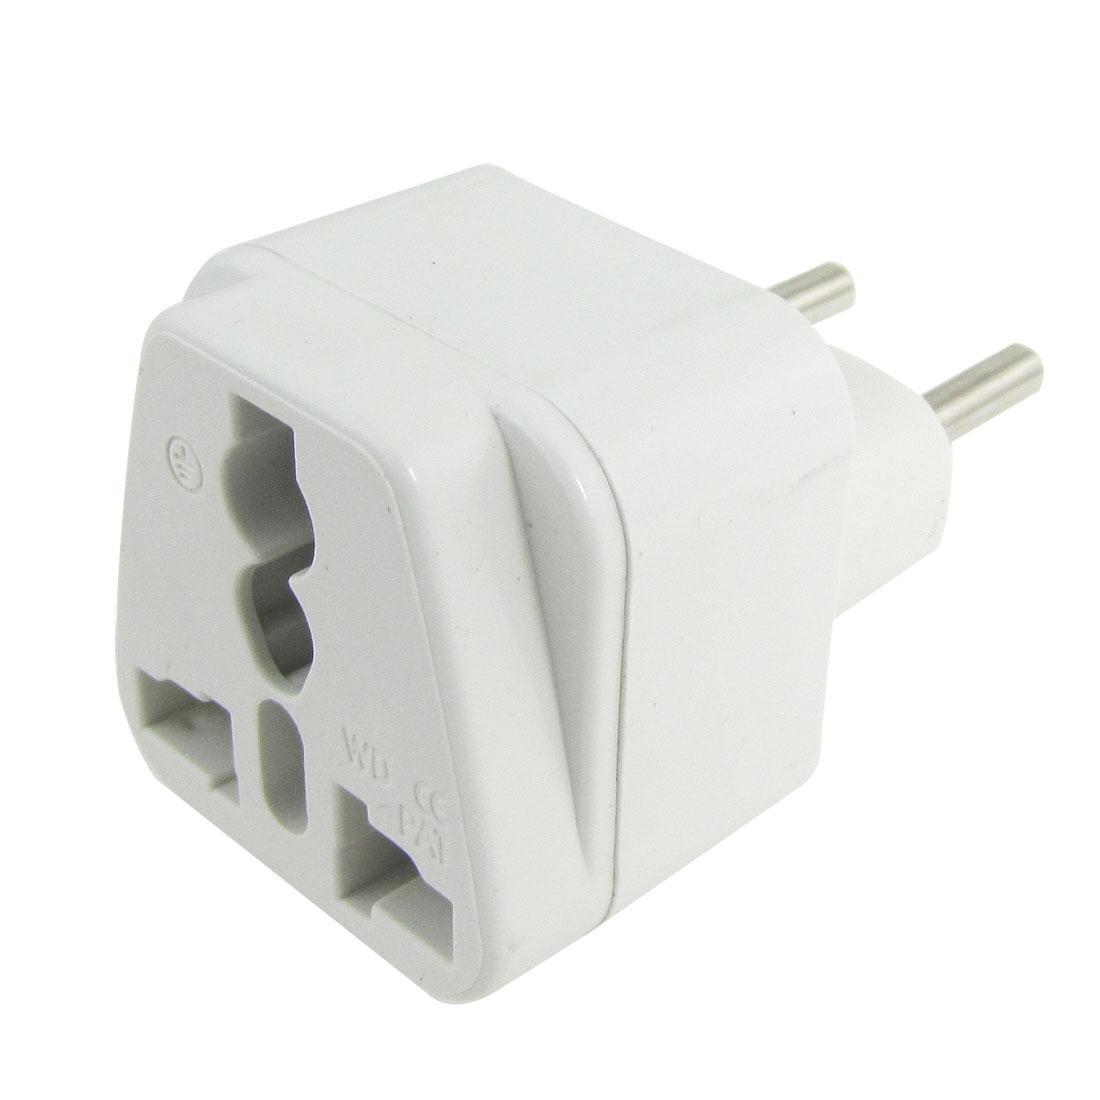 White Plastic Housing AC 10/16A 250V EU US UK Socket Italy Plug